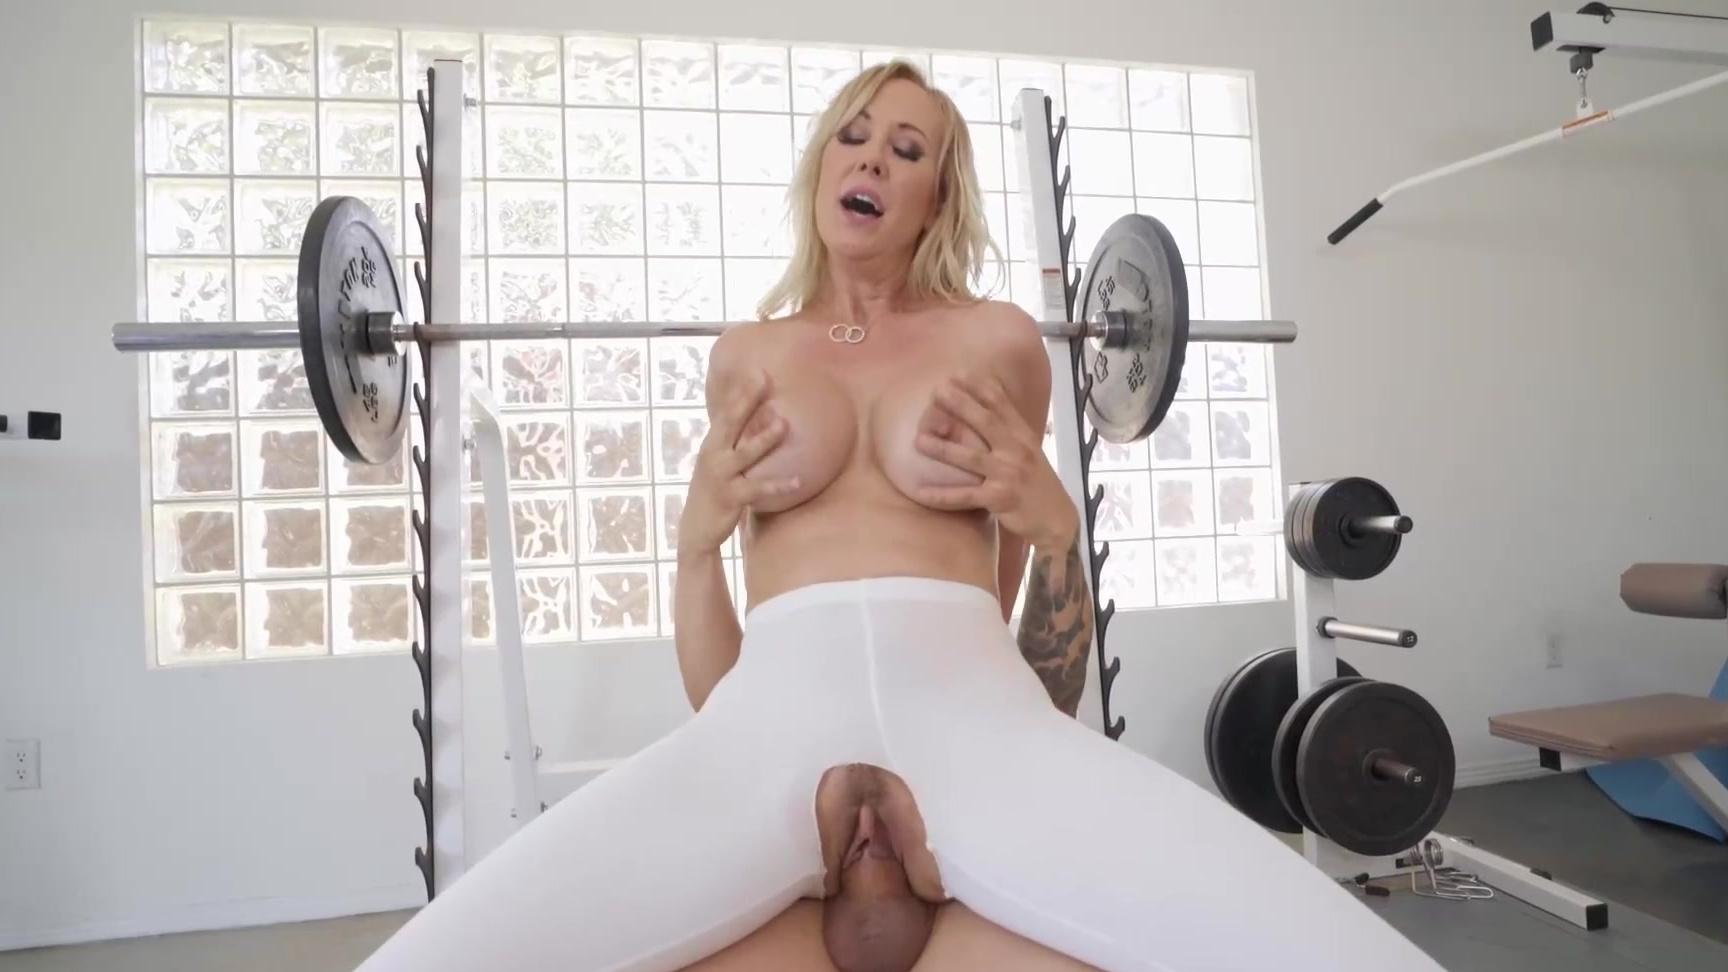 Bea flora oils up her tits in the sauna XXX